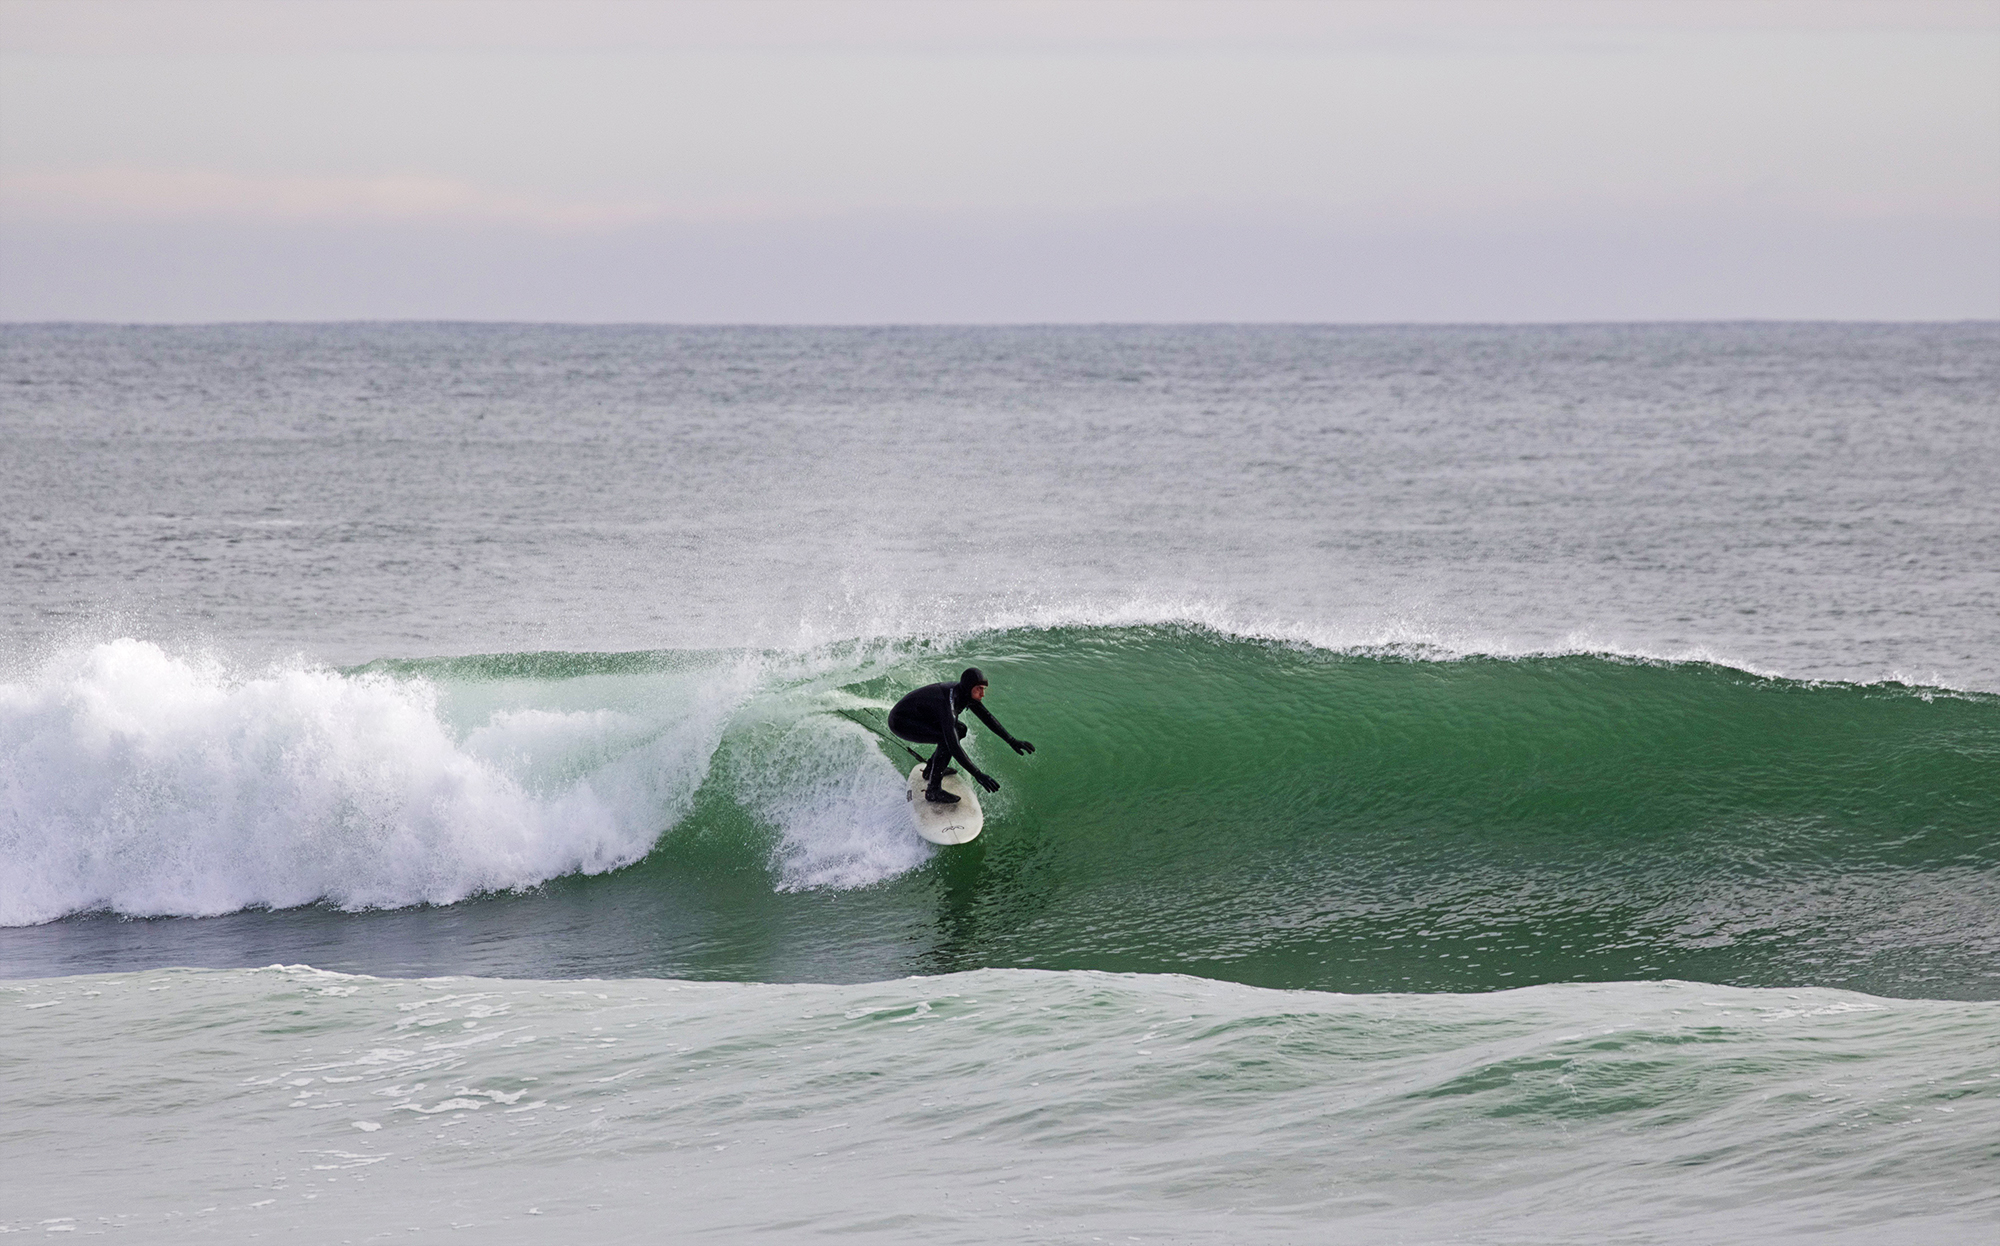 1-19-17 MTK Surfer 15 copy.jpg